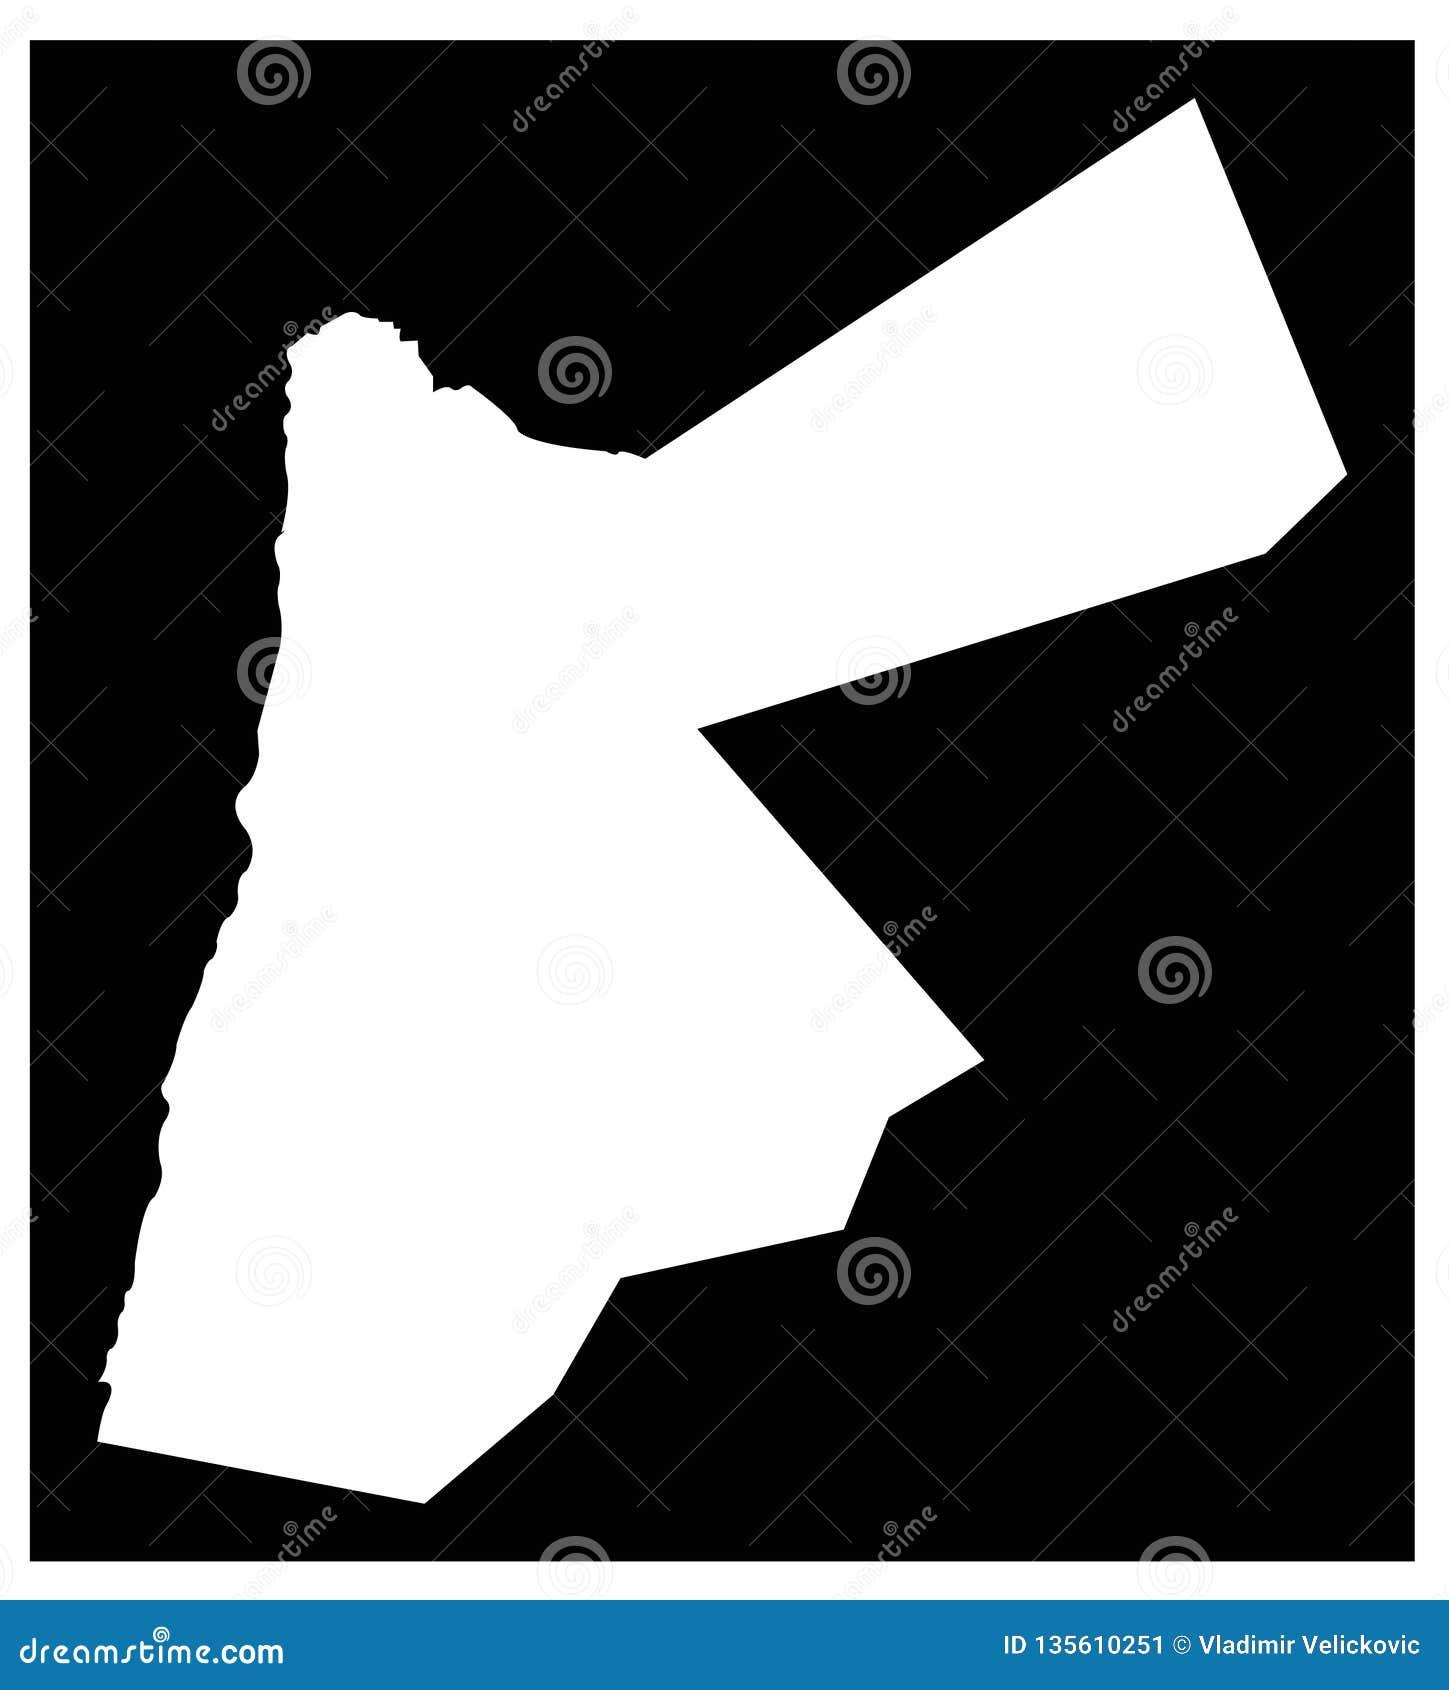 Jordan Map - Hashemite Kingdom Of Jordan Stock Vector - Illustration on saudi arabia map, united kingdom map, people's republic of korea map, brazil map, kingdom of moab, papua new guinea map, aqaba jordan map, antigua and barbuda map, hong kong map, the bahamas map, republic of nauru map, iran map, india map, moldova map, united arab emirates map, jordan geography map, amman-jordan map, bermuda map, french wine map,